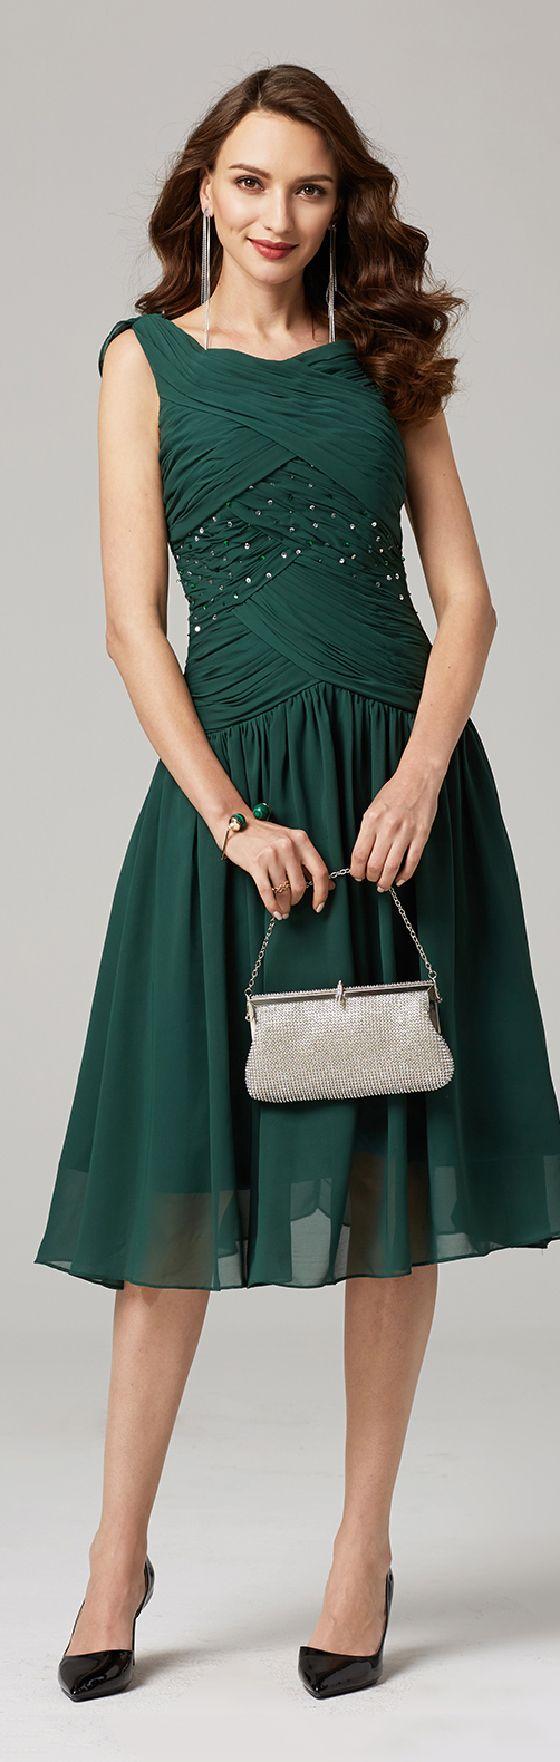 A-Line V-neck Knee Length Chiffon Party Dress with Beading